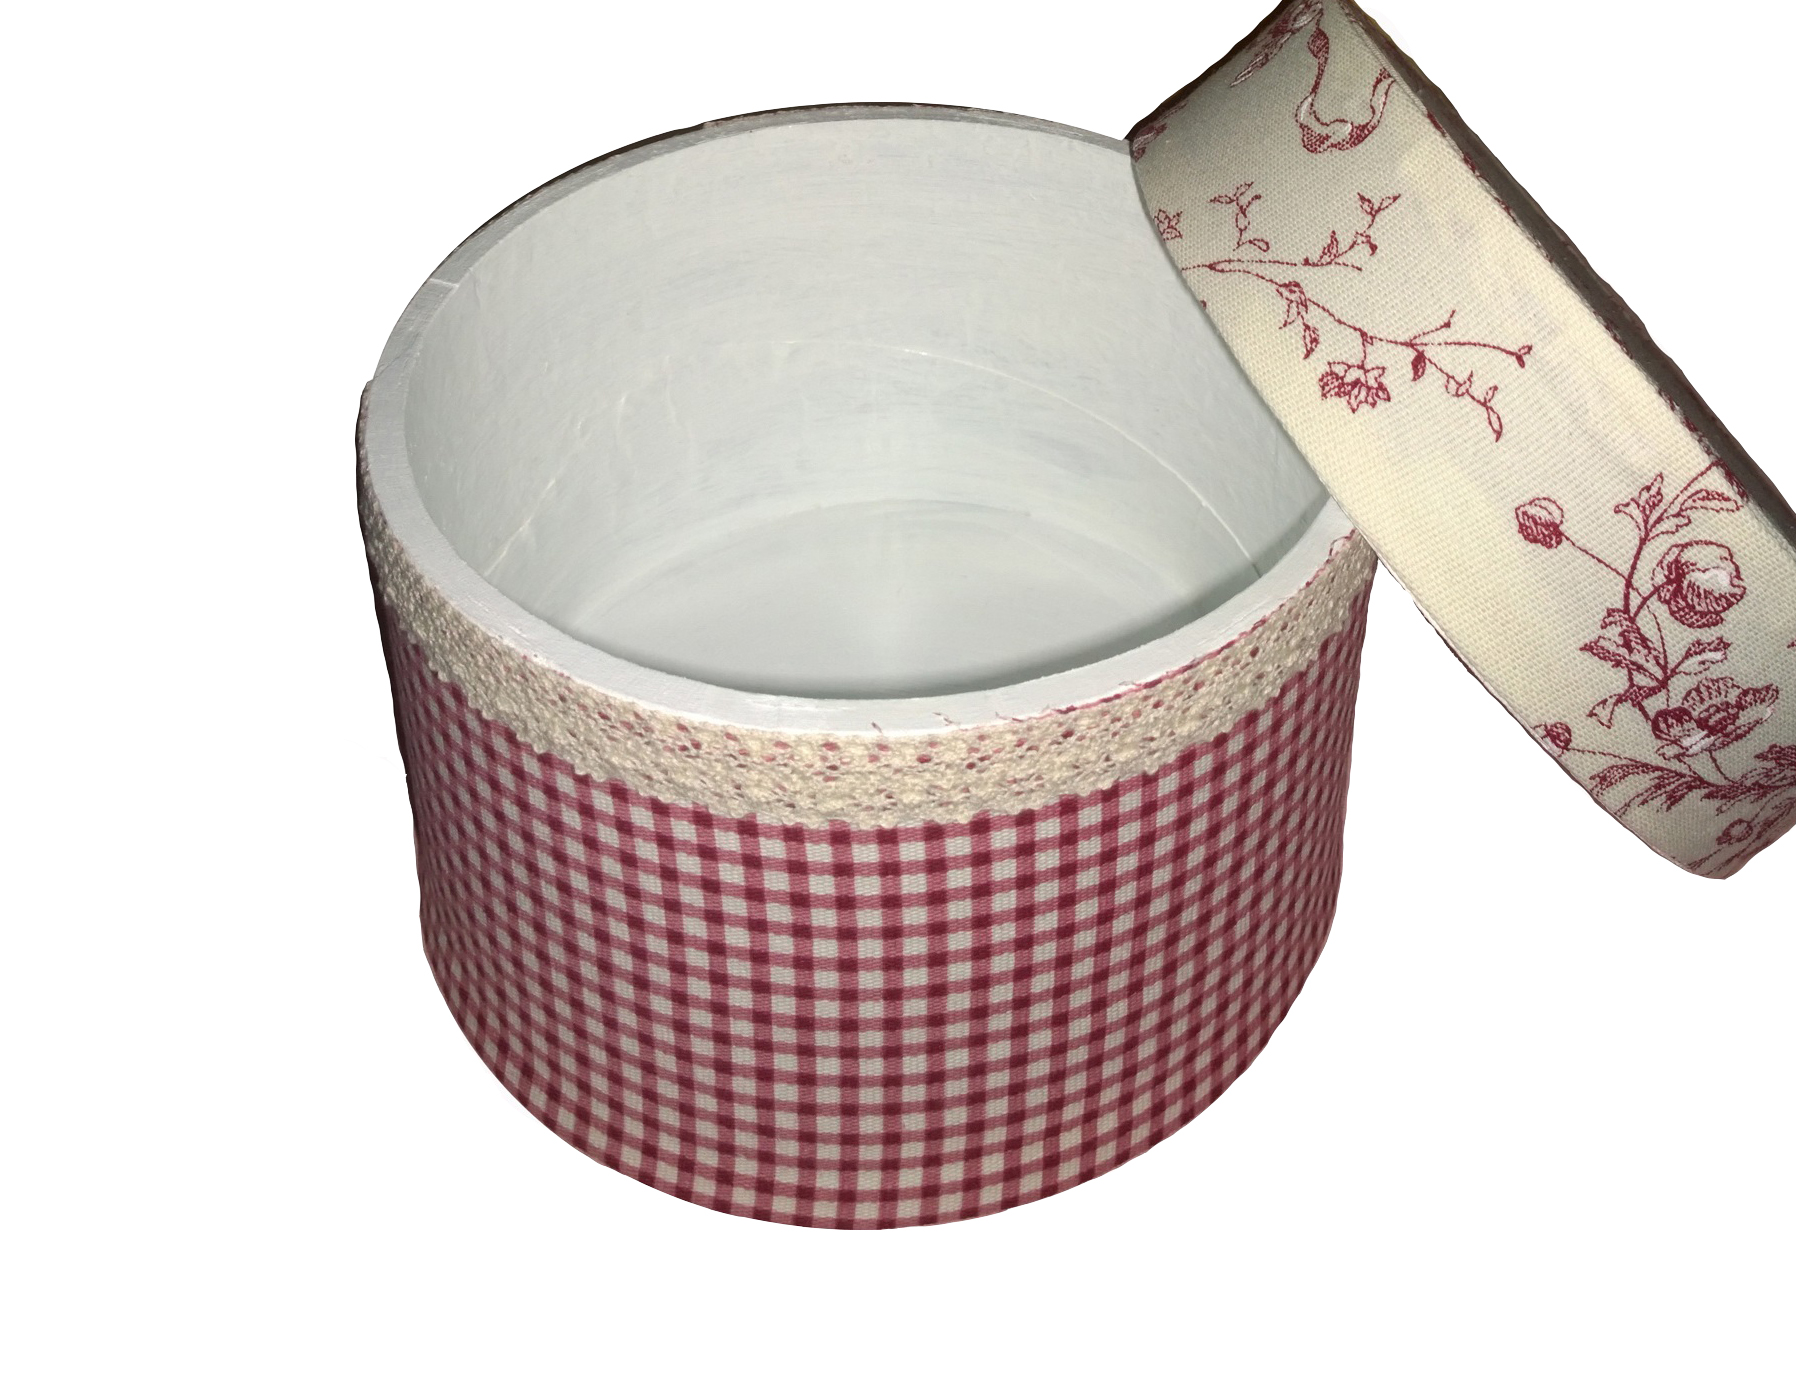 Декоративные коробки-шкатулки Прованс Жуи БордоШкатулки<br>Коробка-шкатулка деревянная декоративная в стиле Прованс для хранения мелочей, рукоделия, шляп&amp;amp;nbsp; &amp;lt;div&amp;gt;&amp;lt;br&amp;gt;&amp;lt;/div&amp;gt;&amp;lt;div&amp;gt;Материал:Снаружи х/б, внутри белая краска&amp;lt;/div&amp;gt;<br><br>Material: МДФ<br>Length см: None<br>Width см: None<br>Depth см: None<br>Height см: 25<br>Diameter см: 21